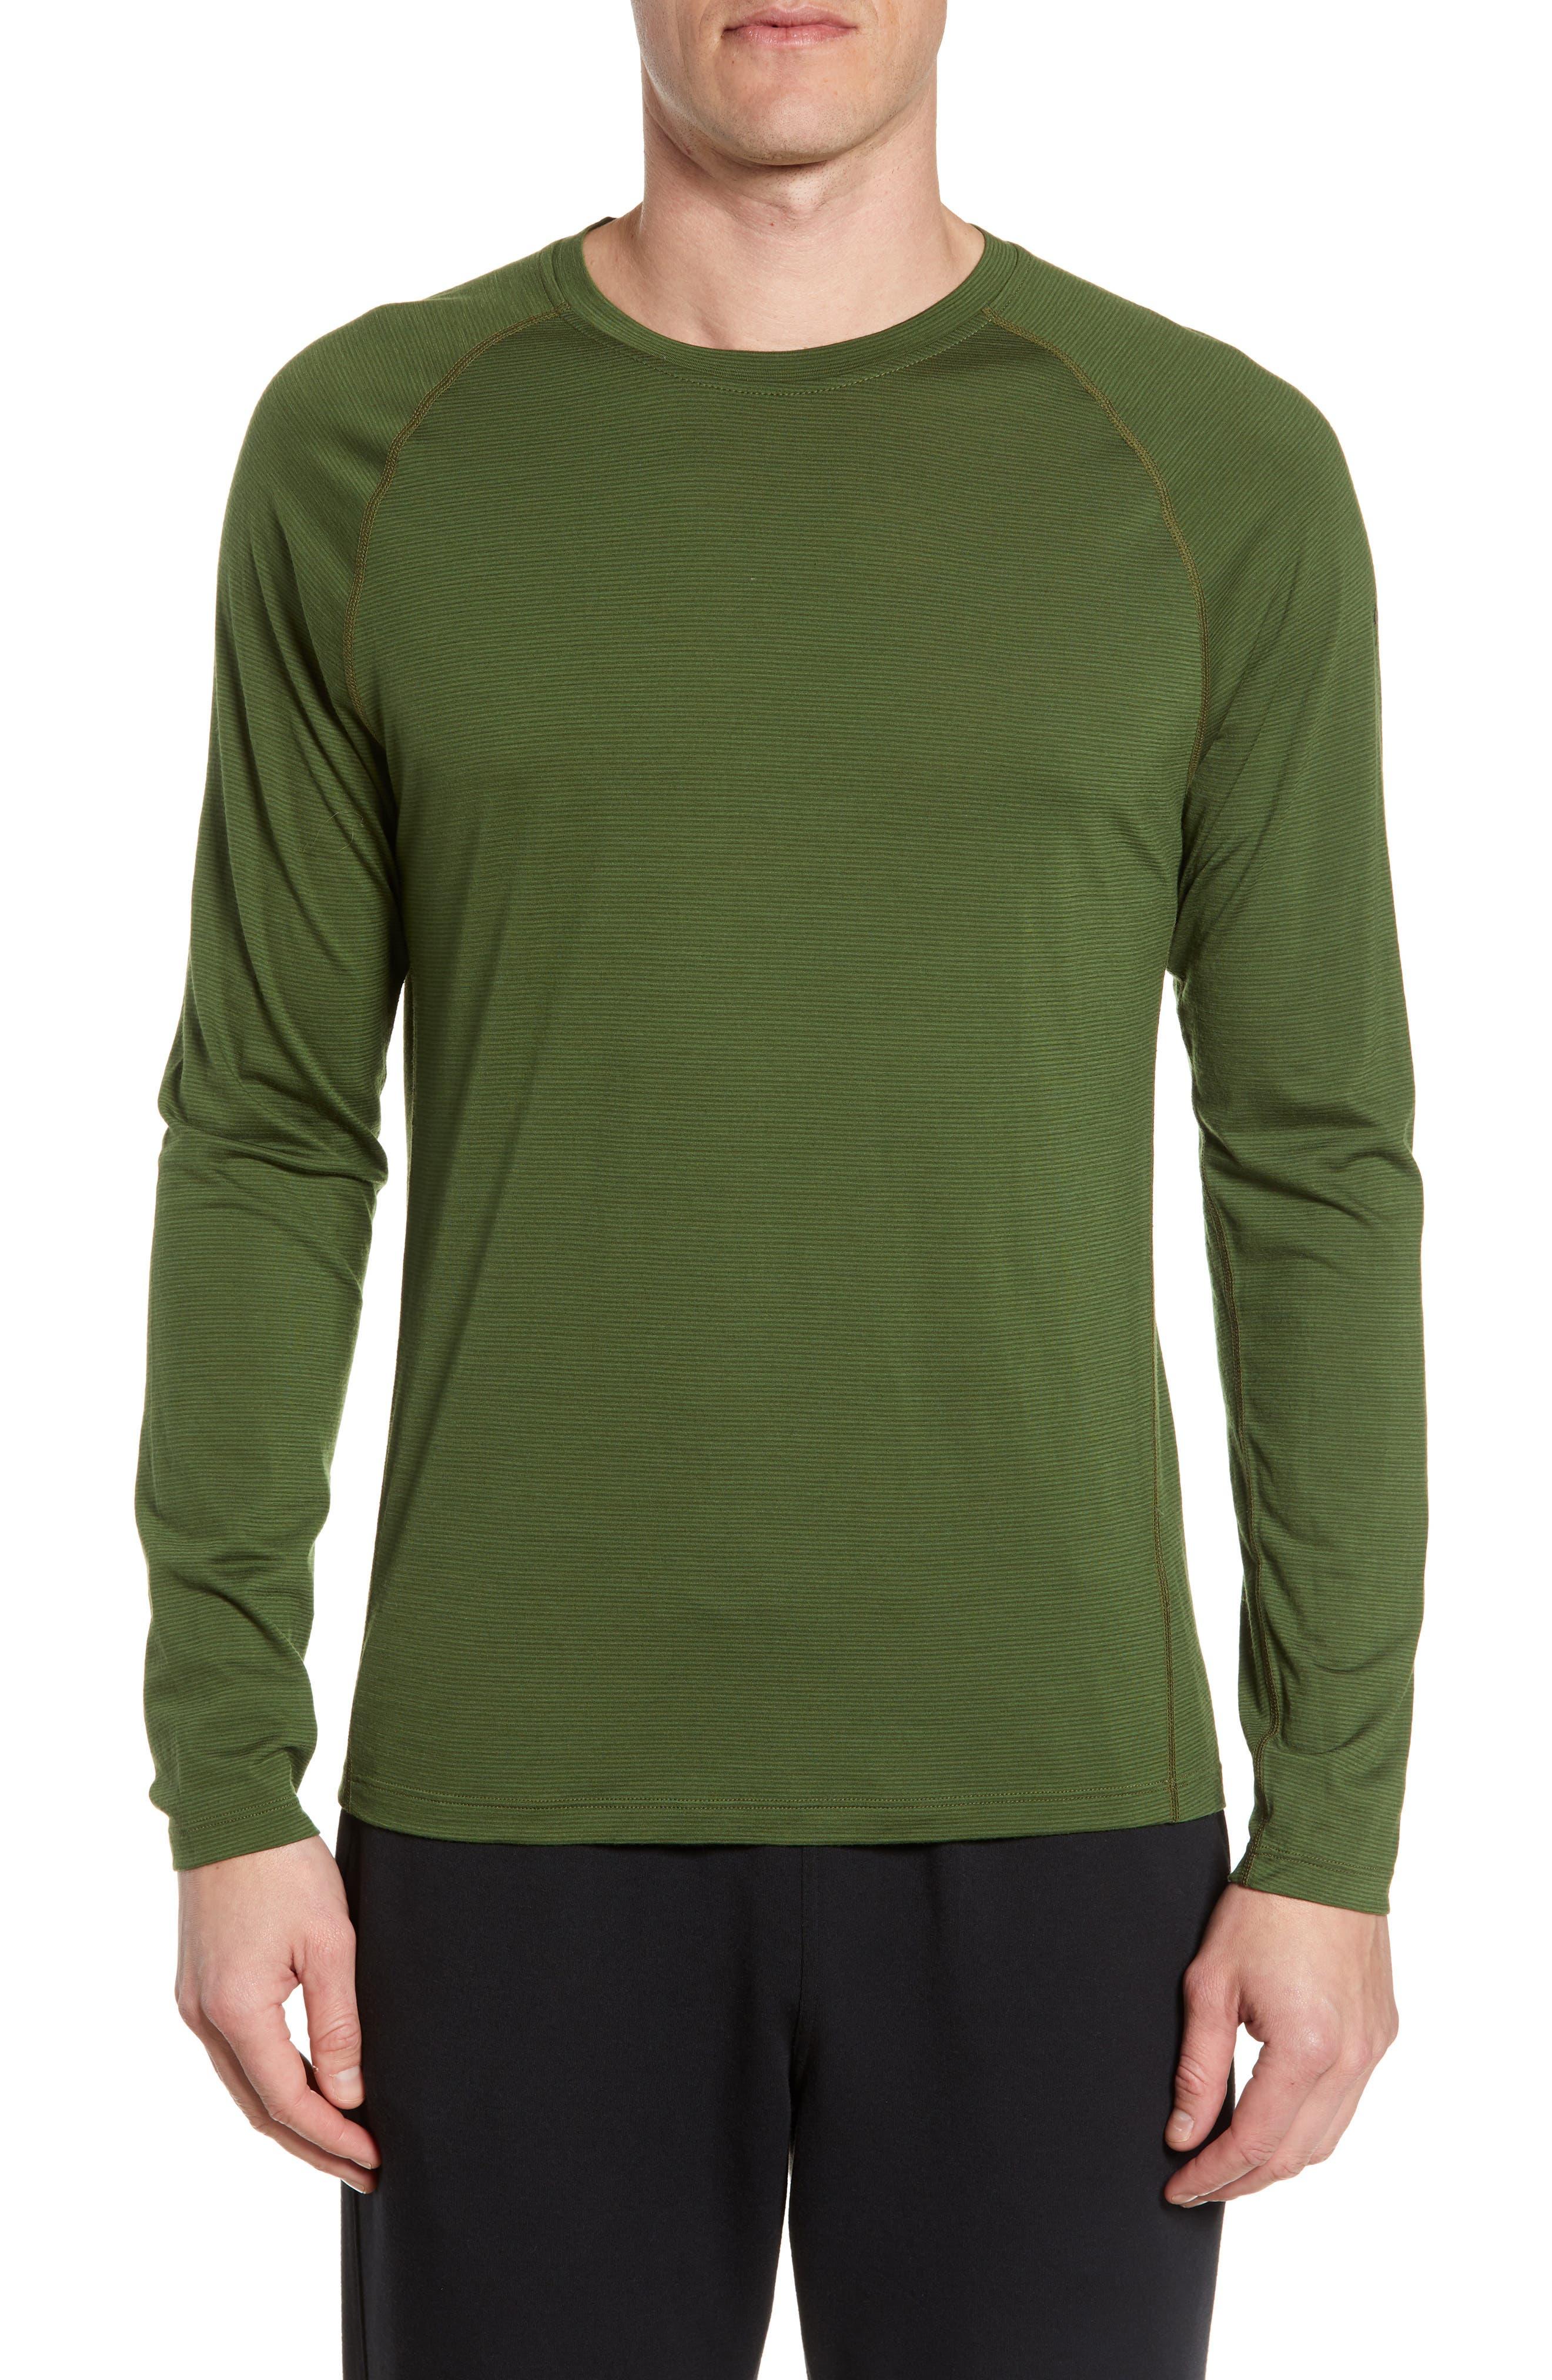 Smartwool Stripe Merino Blend T-Shirt, Green